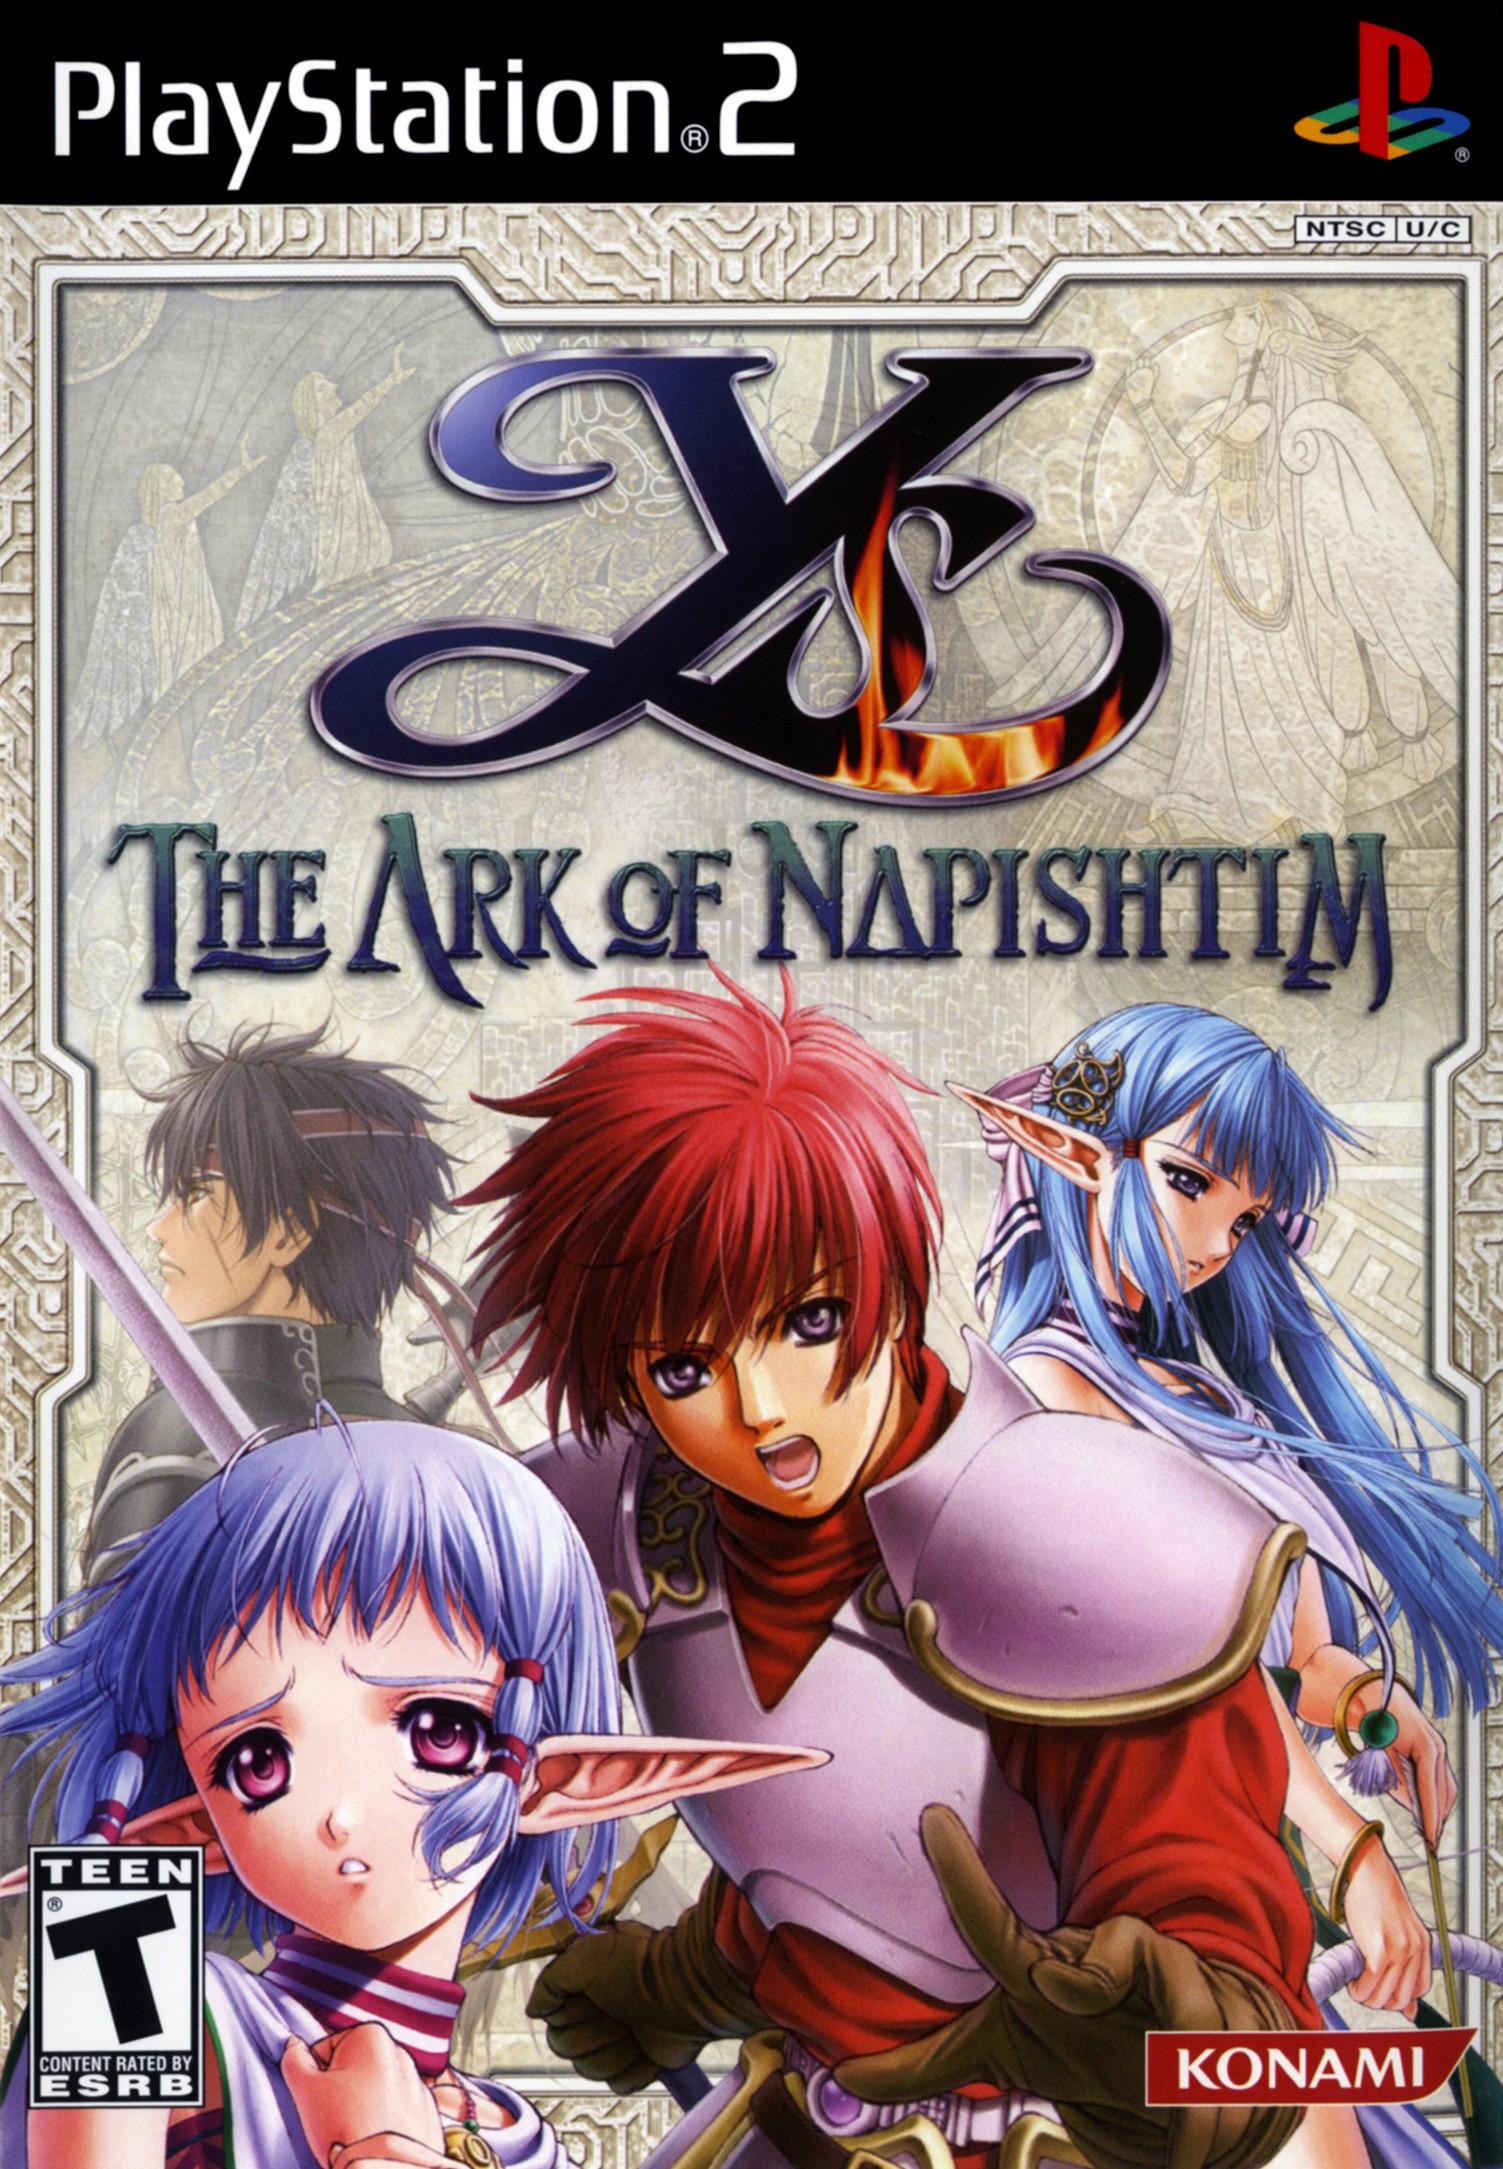 Ys The Ark Of Napishtim/PS2